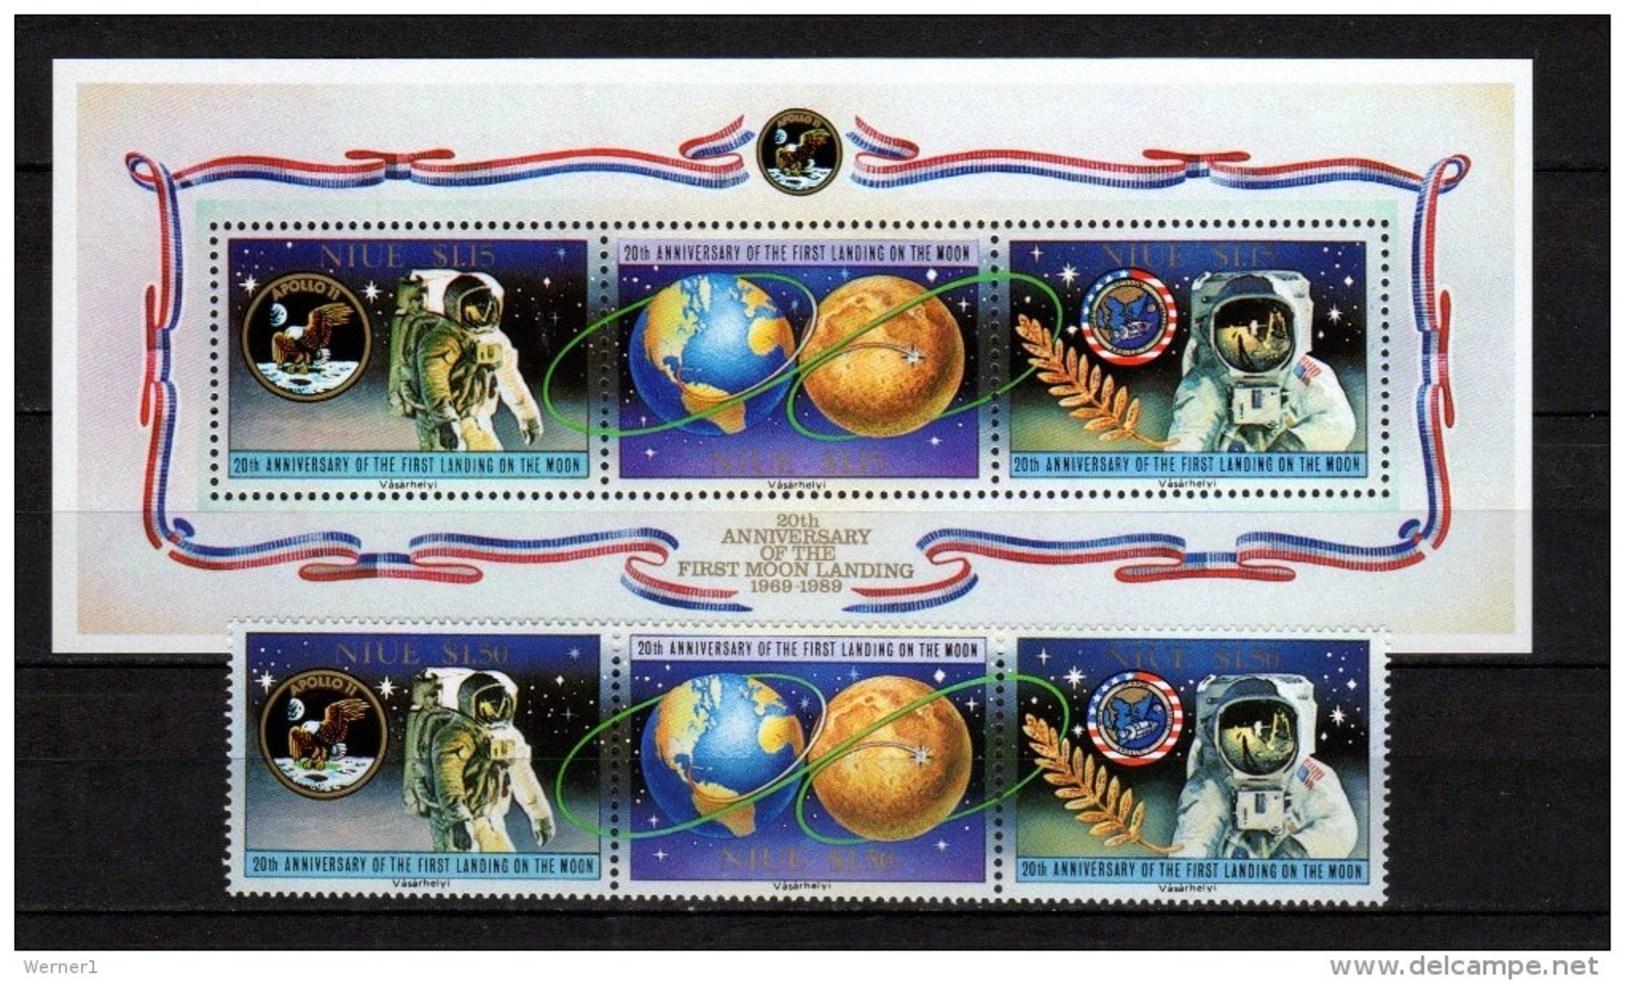 Niue 1989 Space Apollo 11 Moon Landing 20th Anniversary, Set Of 3 + S/s MNH - Raumfahrt